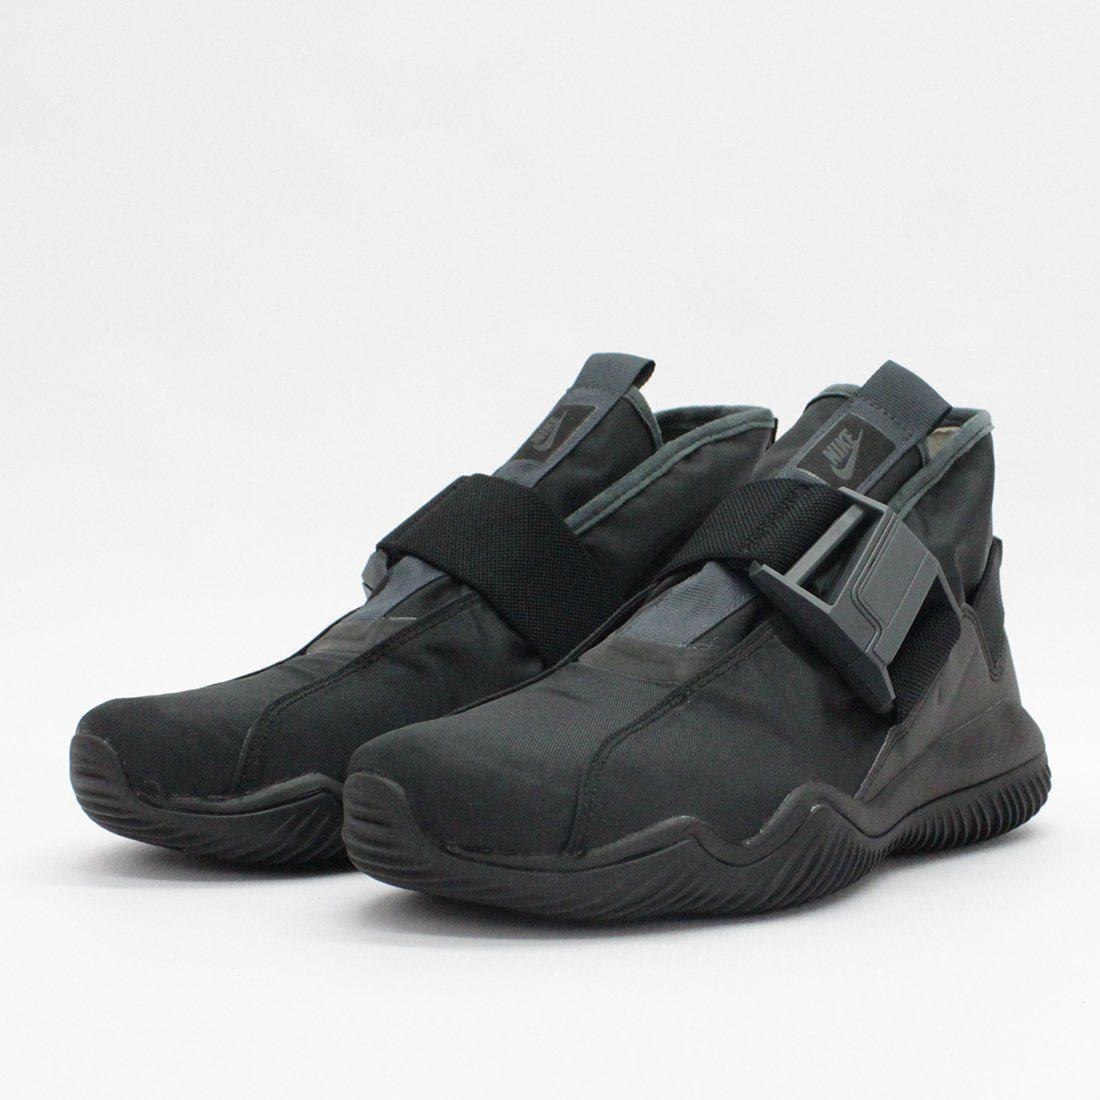 best loved 4b2fa 6facd Nike Trainers - Nike Komyuter Se Black Aa0531 001 for Men - Lyst. View  fullscreen